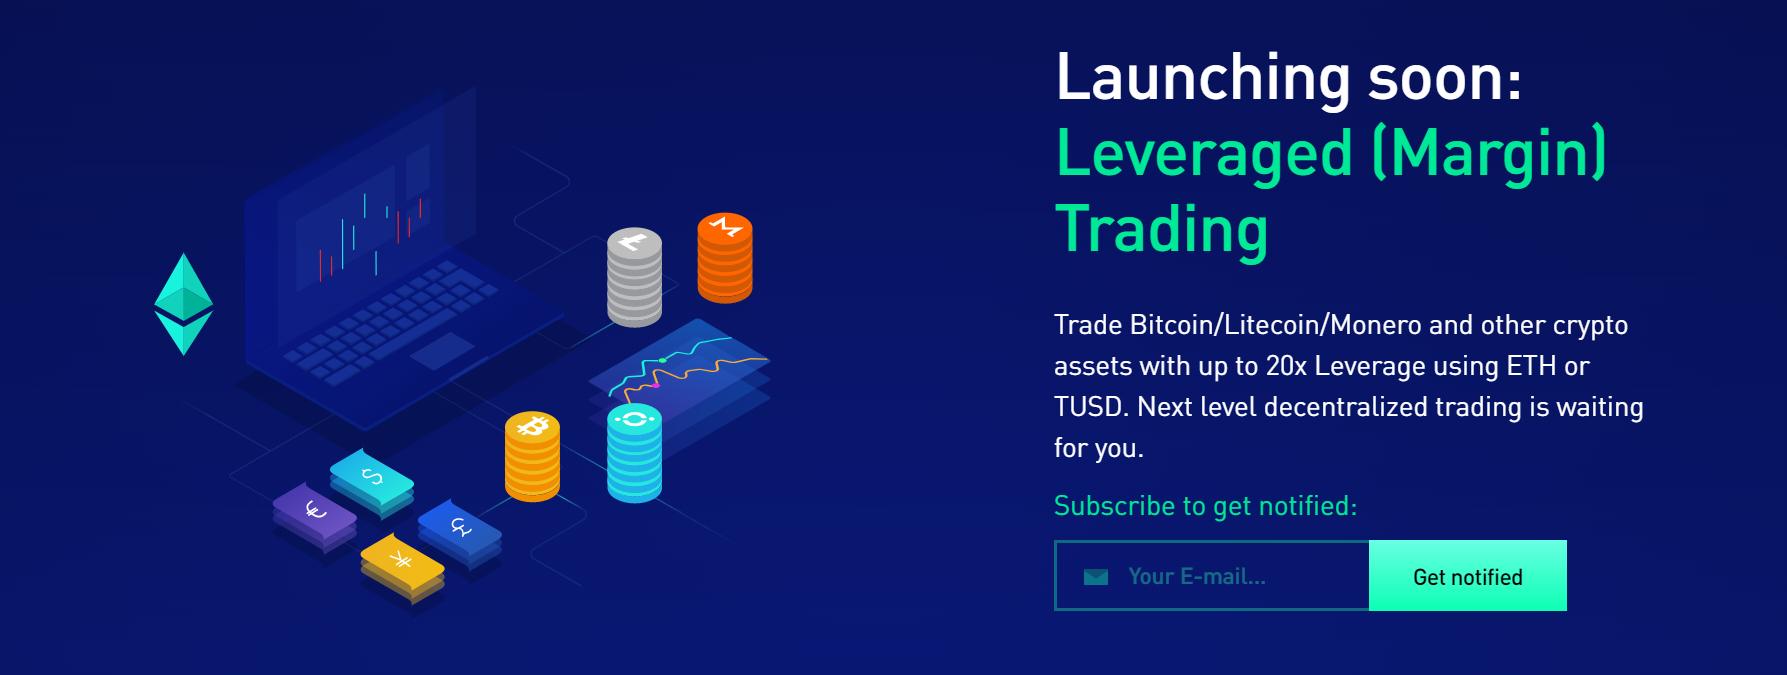 EtherMium Leveraged Trading